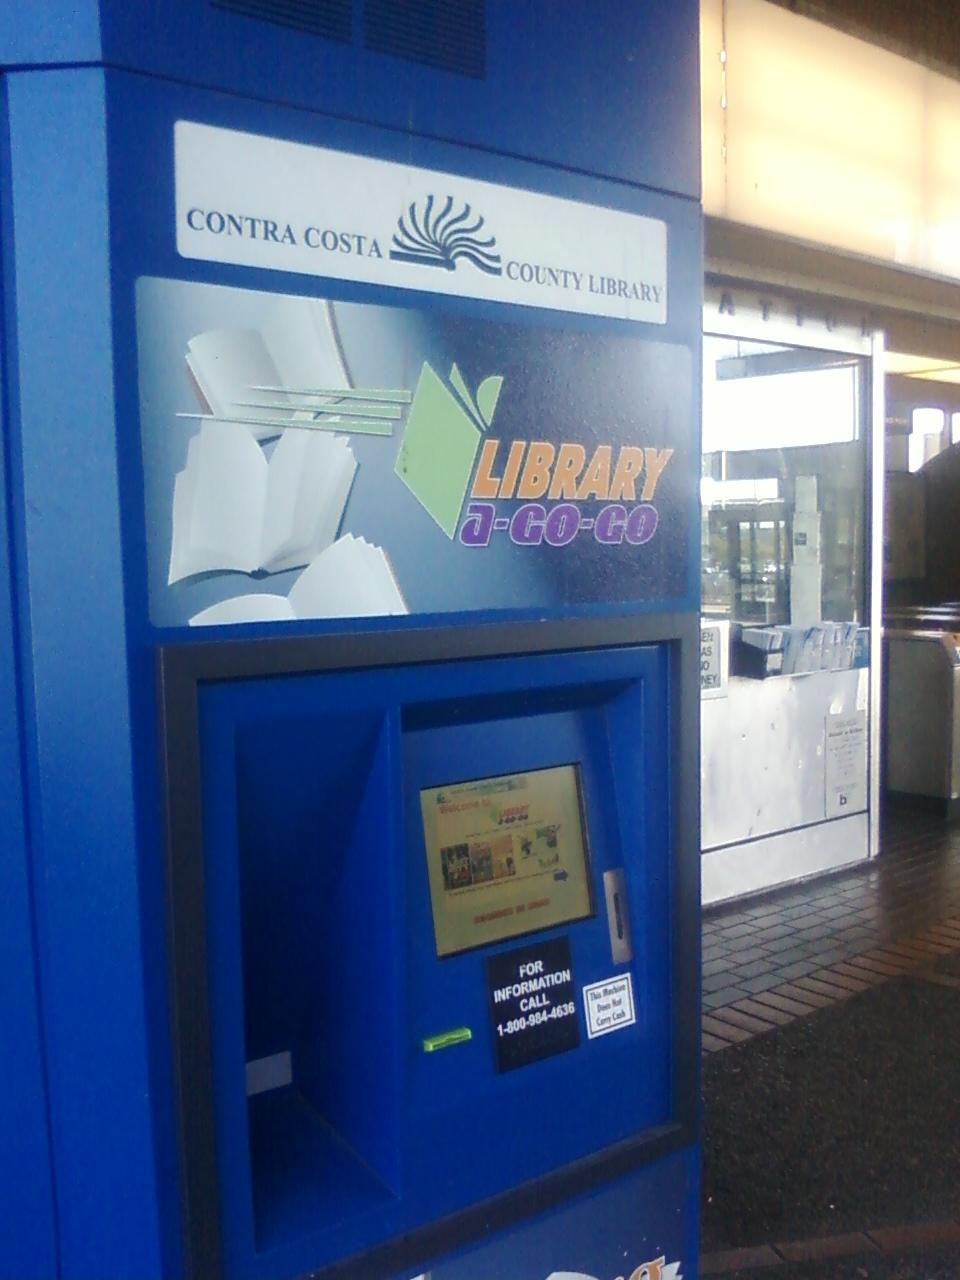 libraryagogo.jpeg